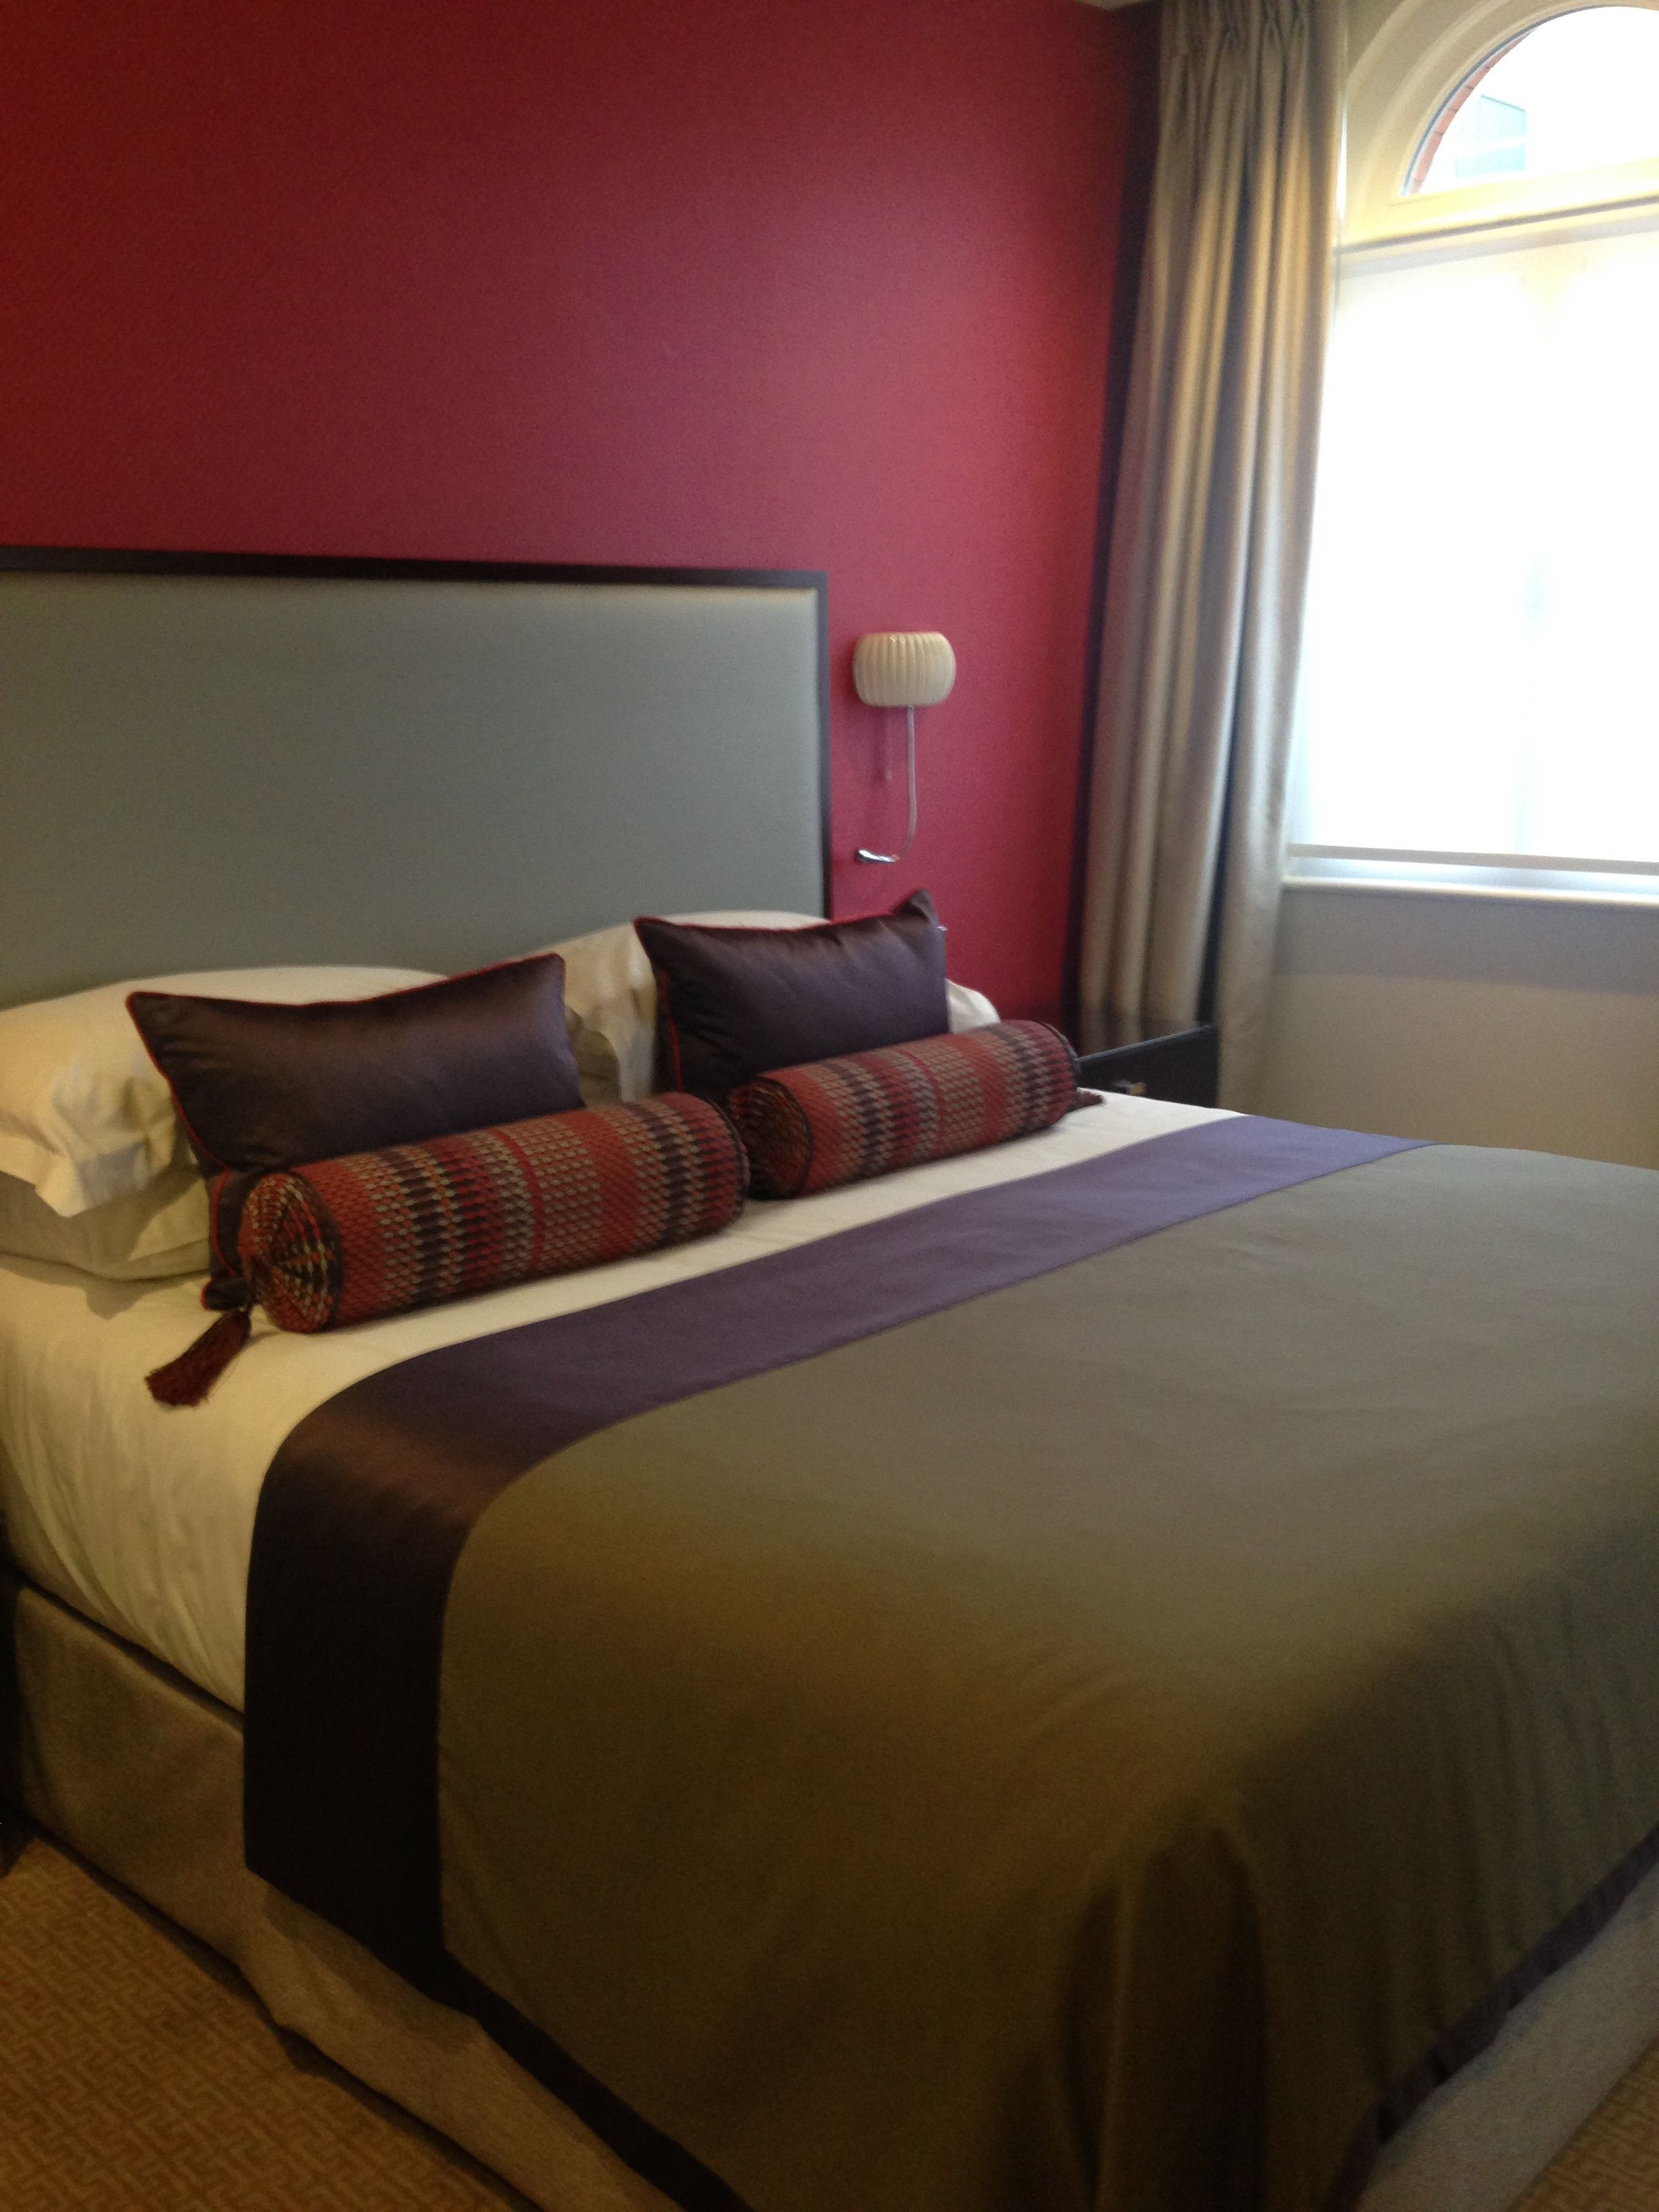 Hotel Room Designs: Img_5847_2.jpg (Obrazek JPEG, 2448×3264 Pikseli)